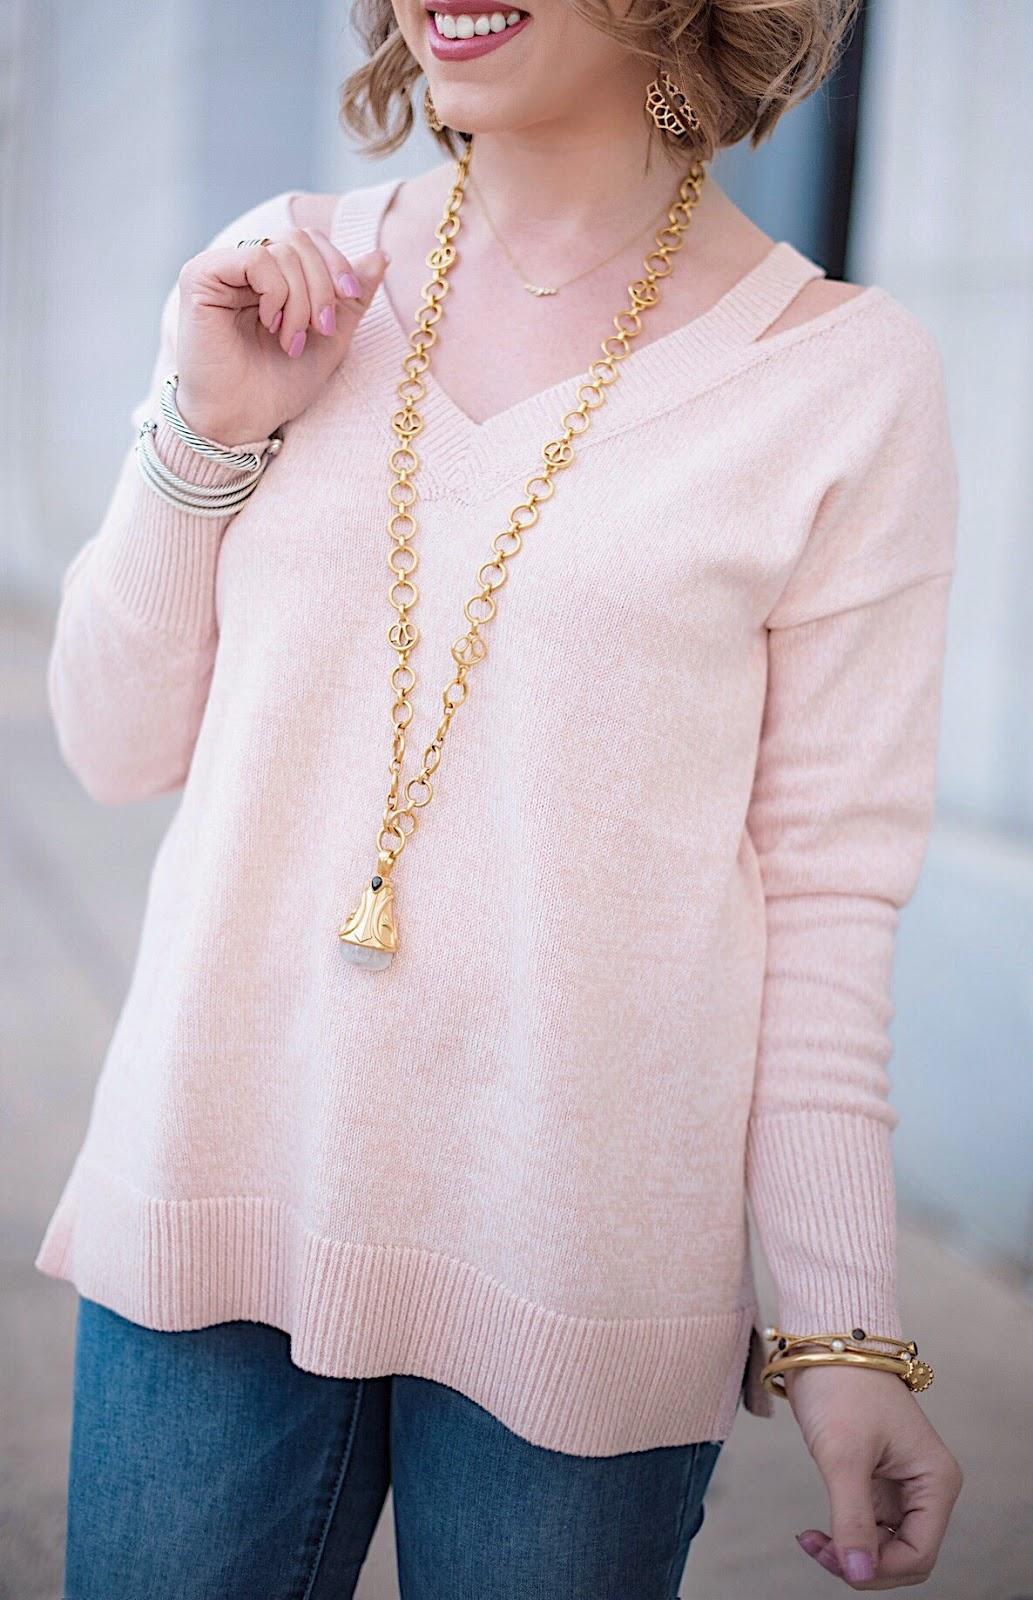 Loft Cutout V-Neck Sweater - Something Delightful Blog